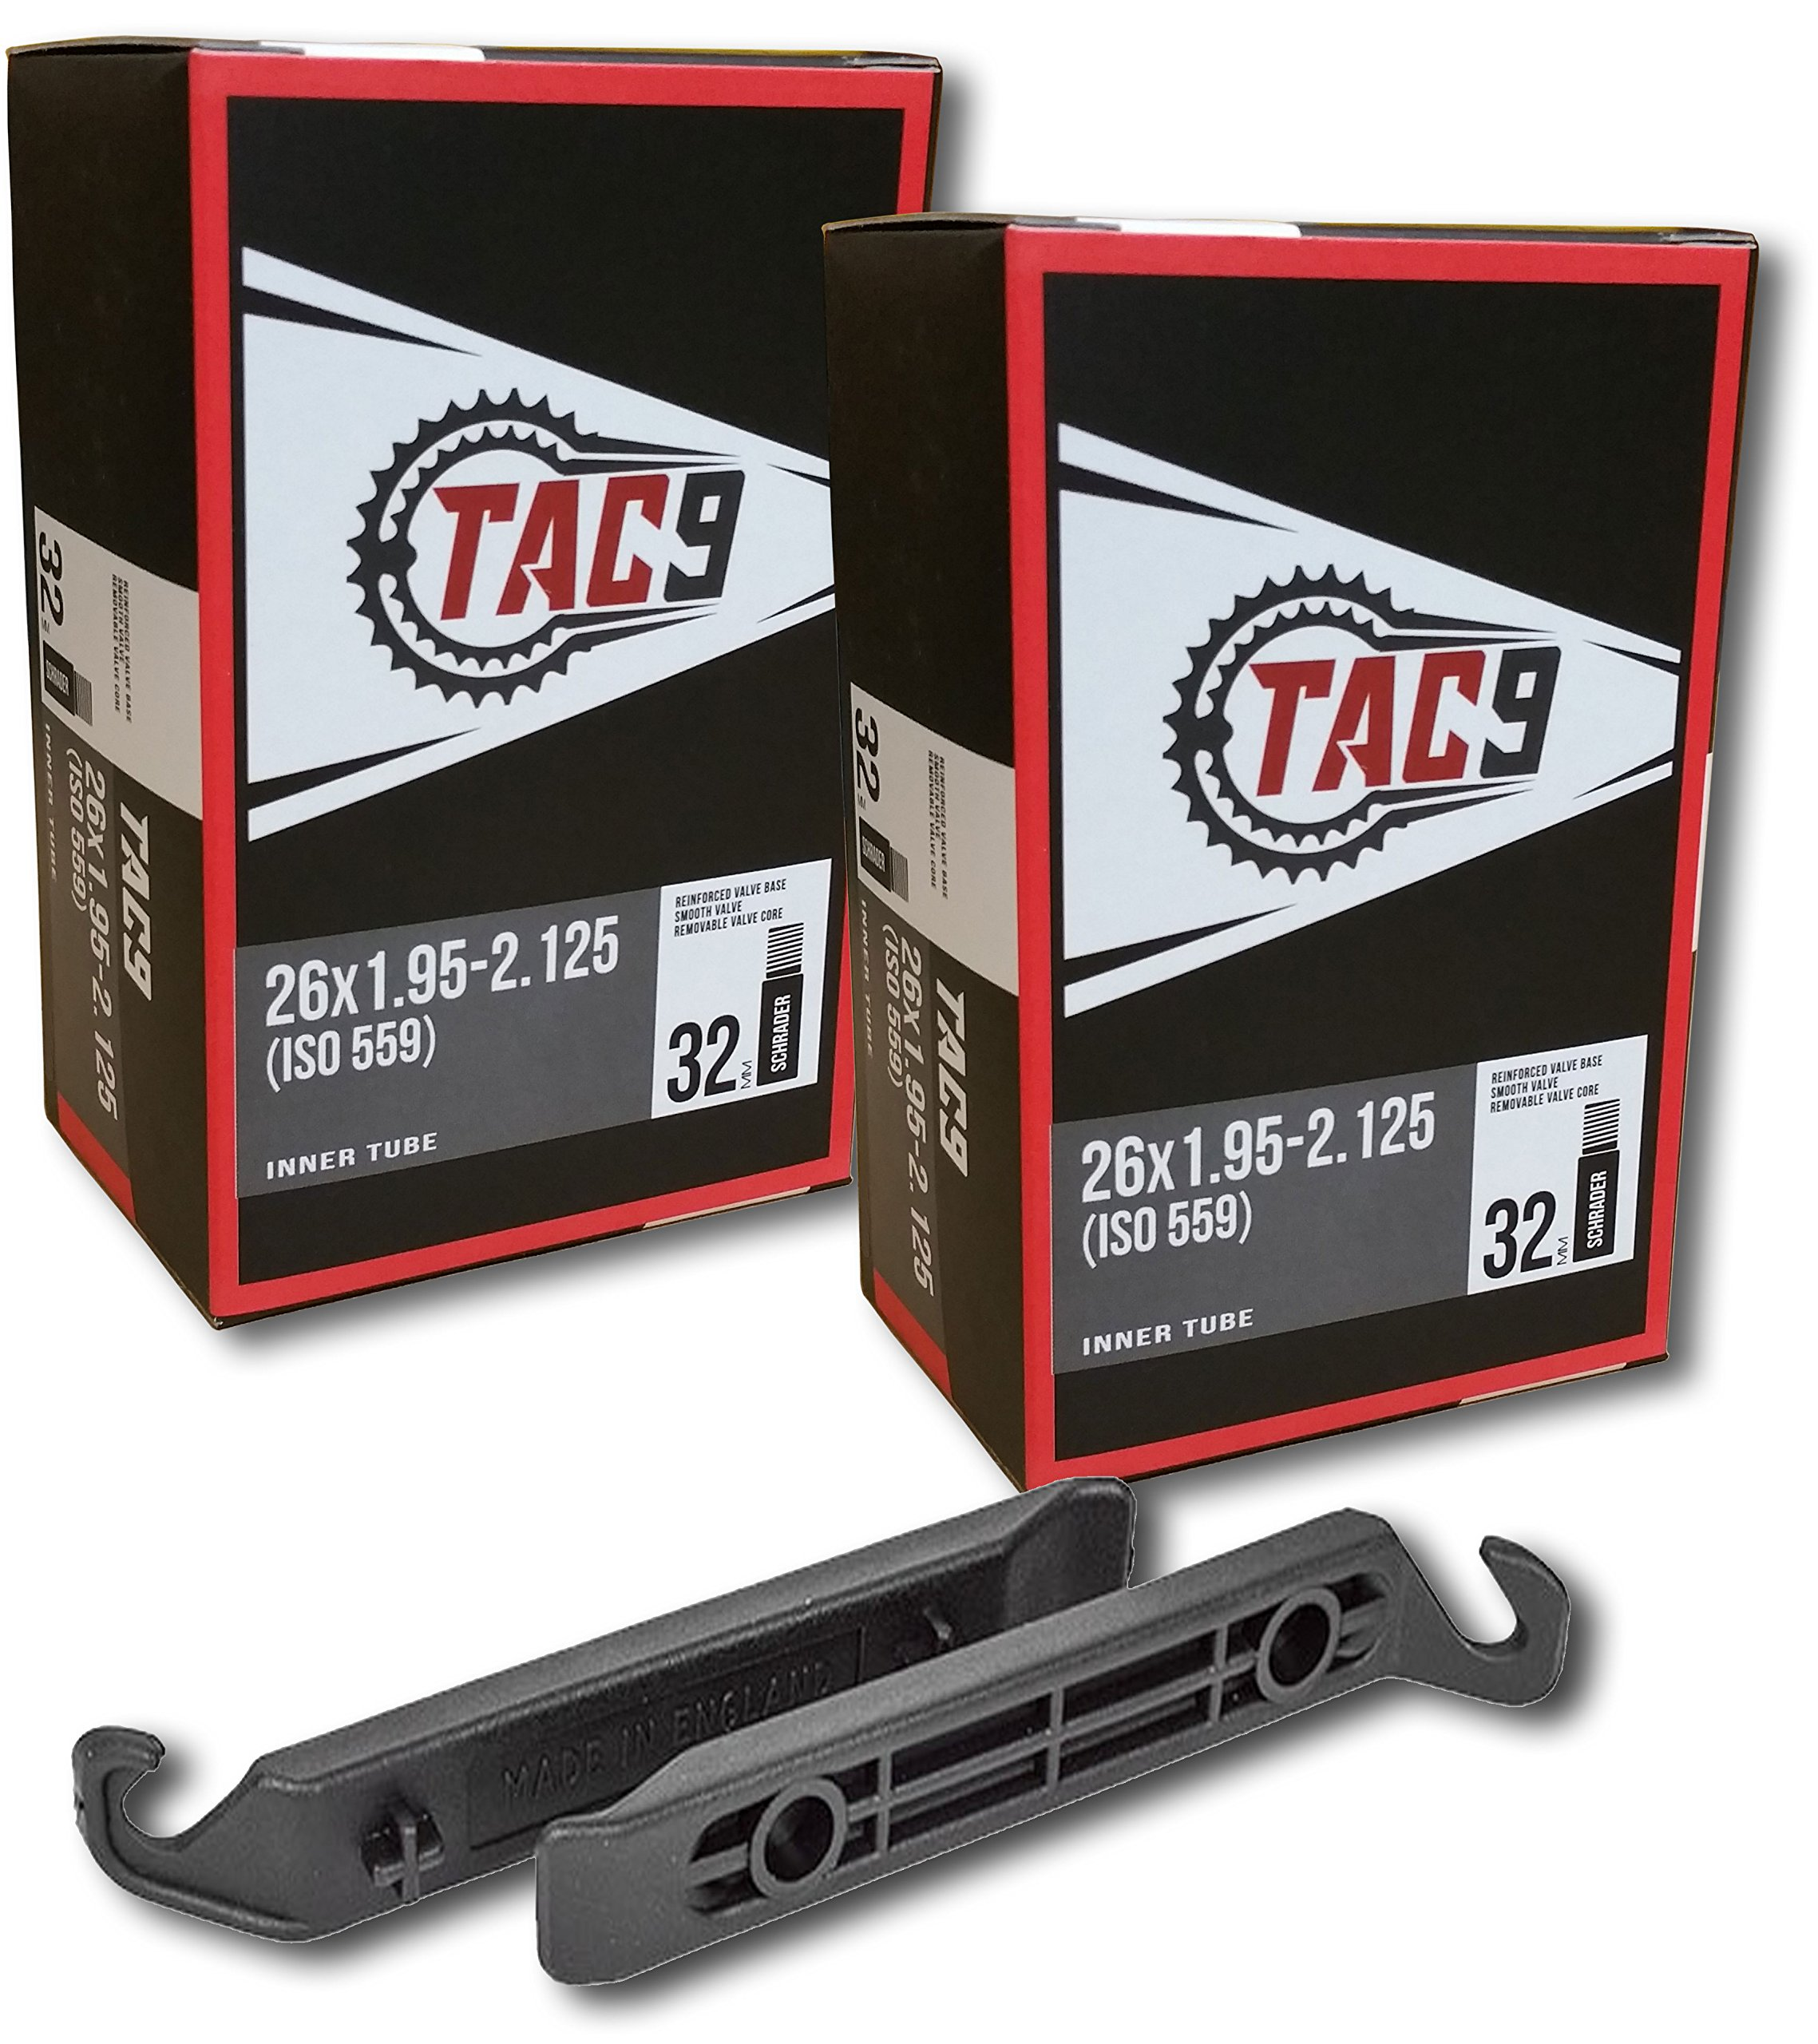 TAC 9 2 Pack Bike Tubes, 26 x 1.95-2.125'' Regular Valve 32mm - Tubes and Tire Levers ONLY Bundle